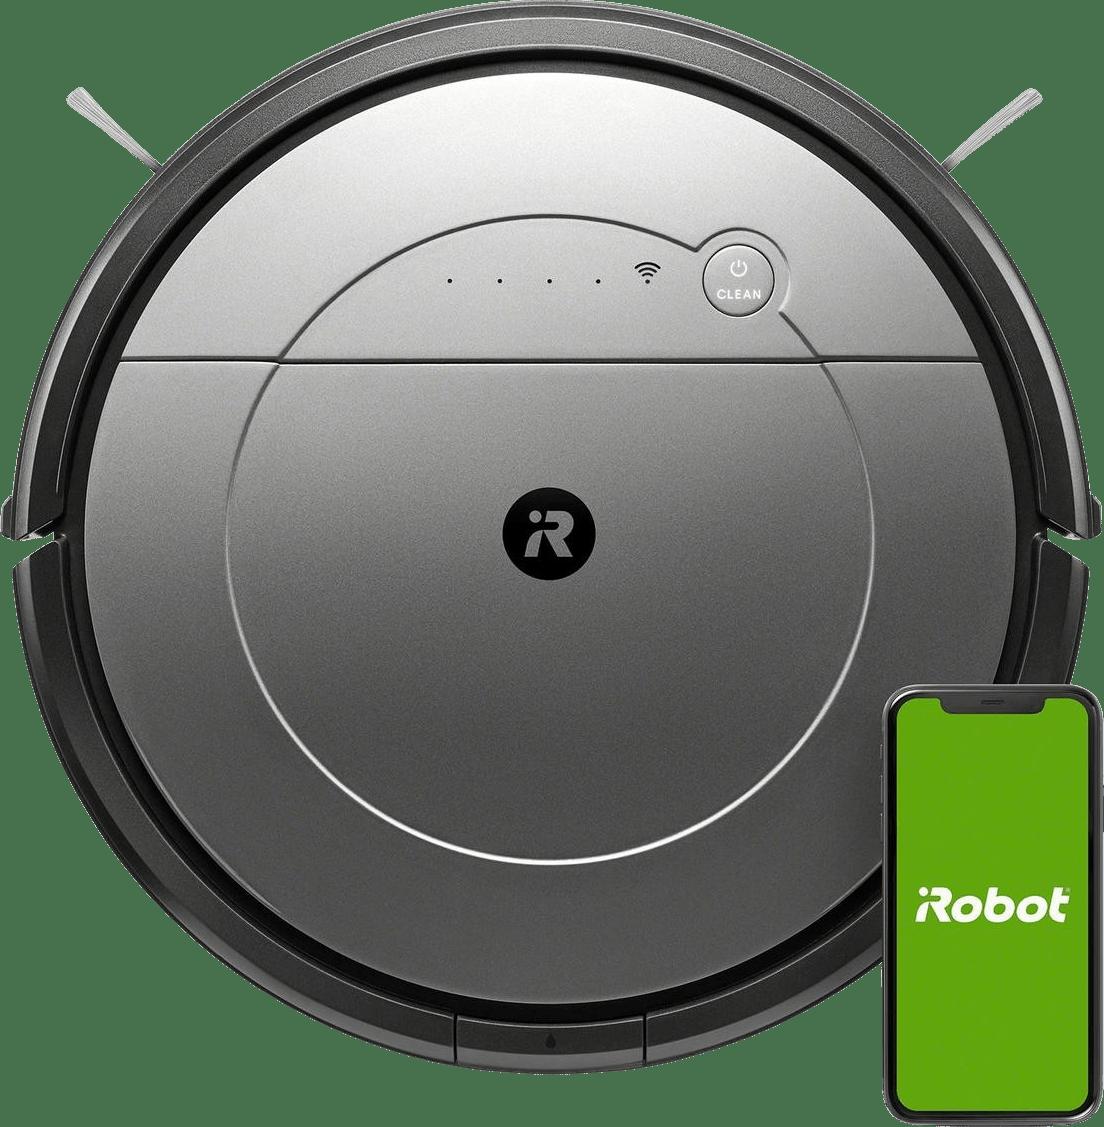 Grau iRobot Roomba Combo Saugroboter mit Wischfunktion.1